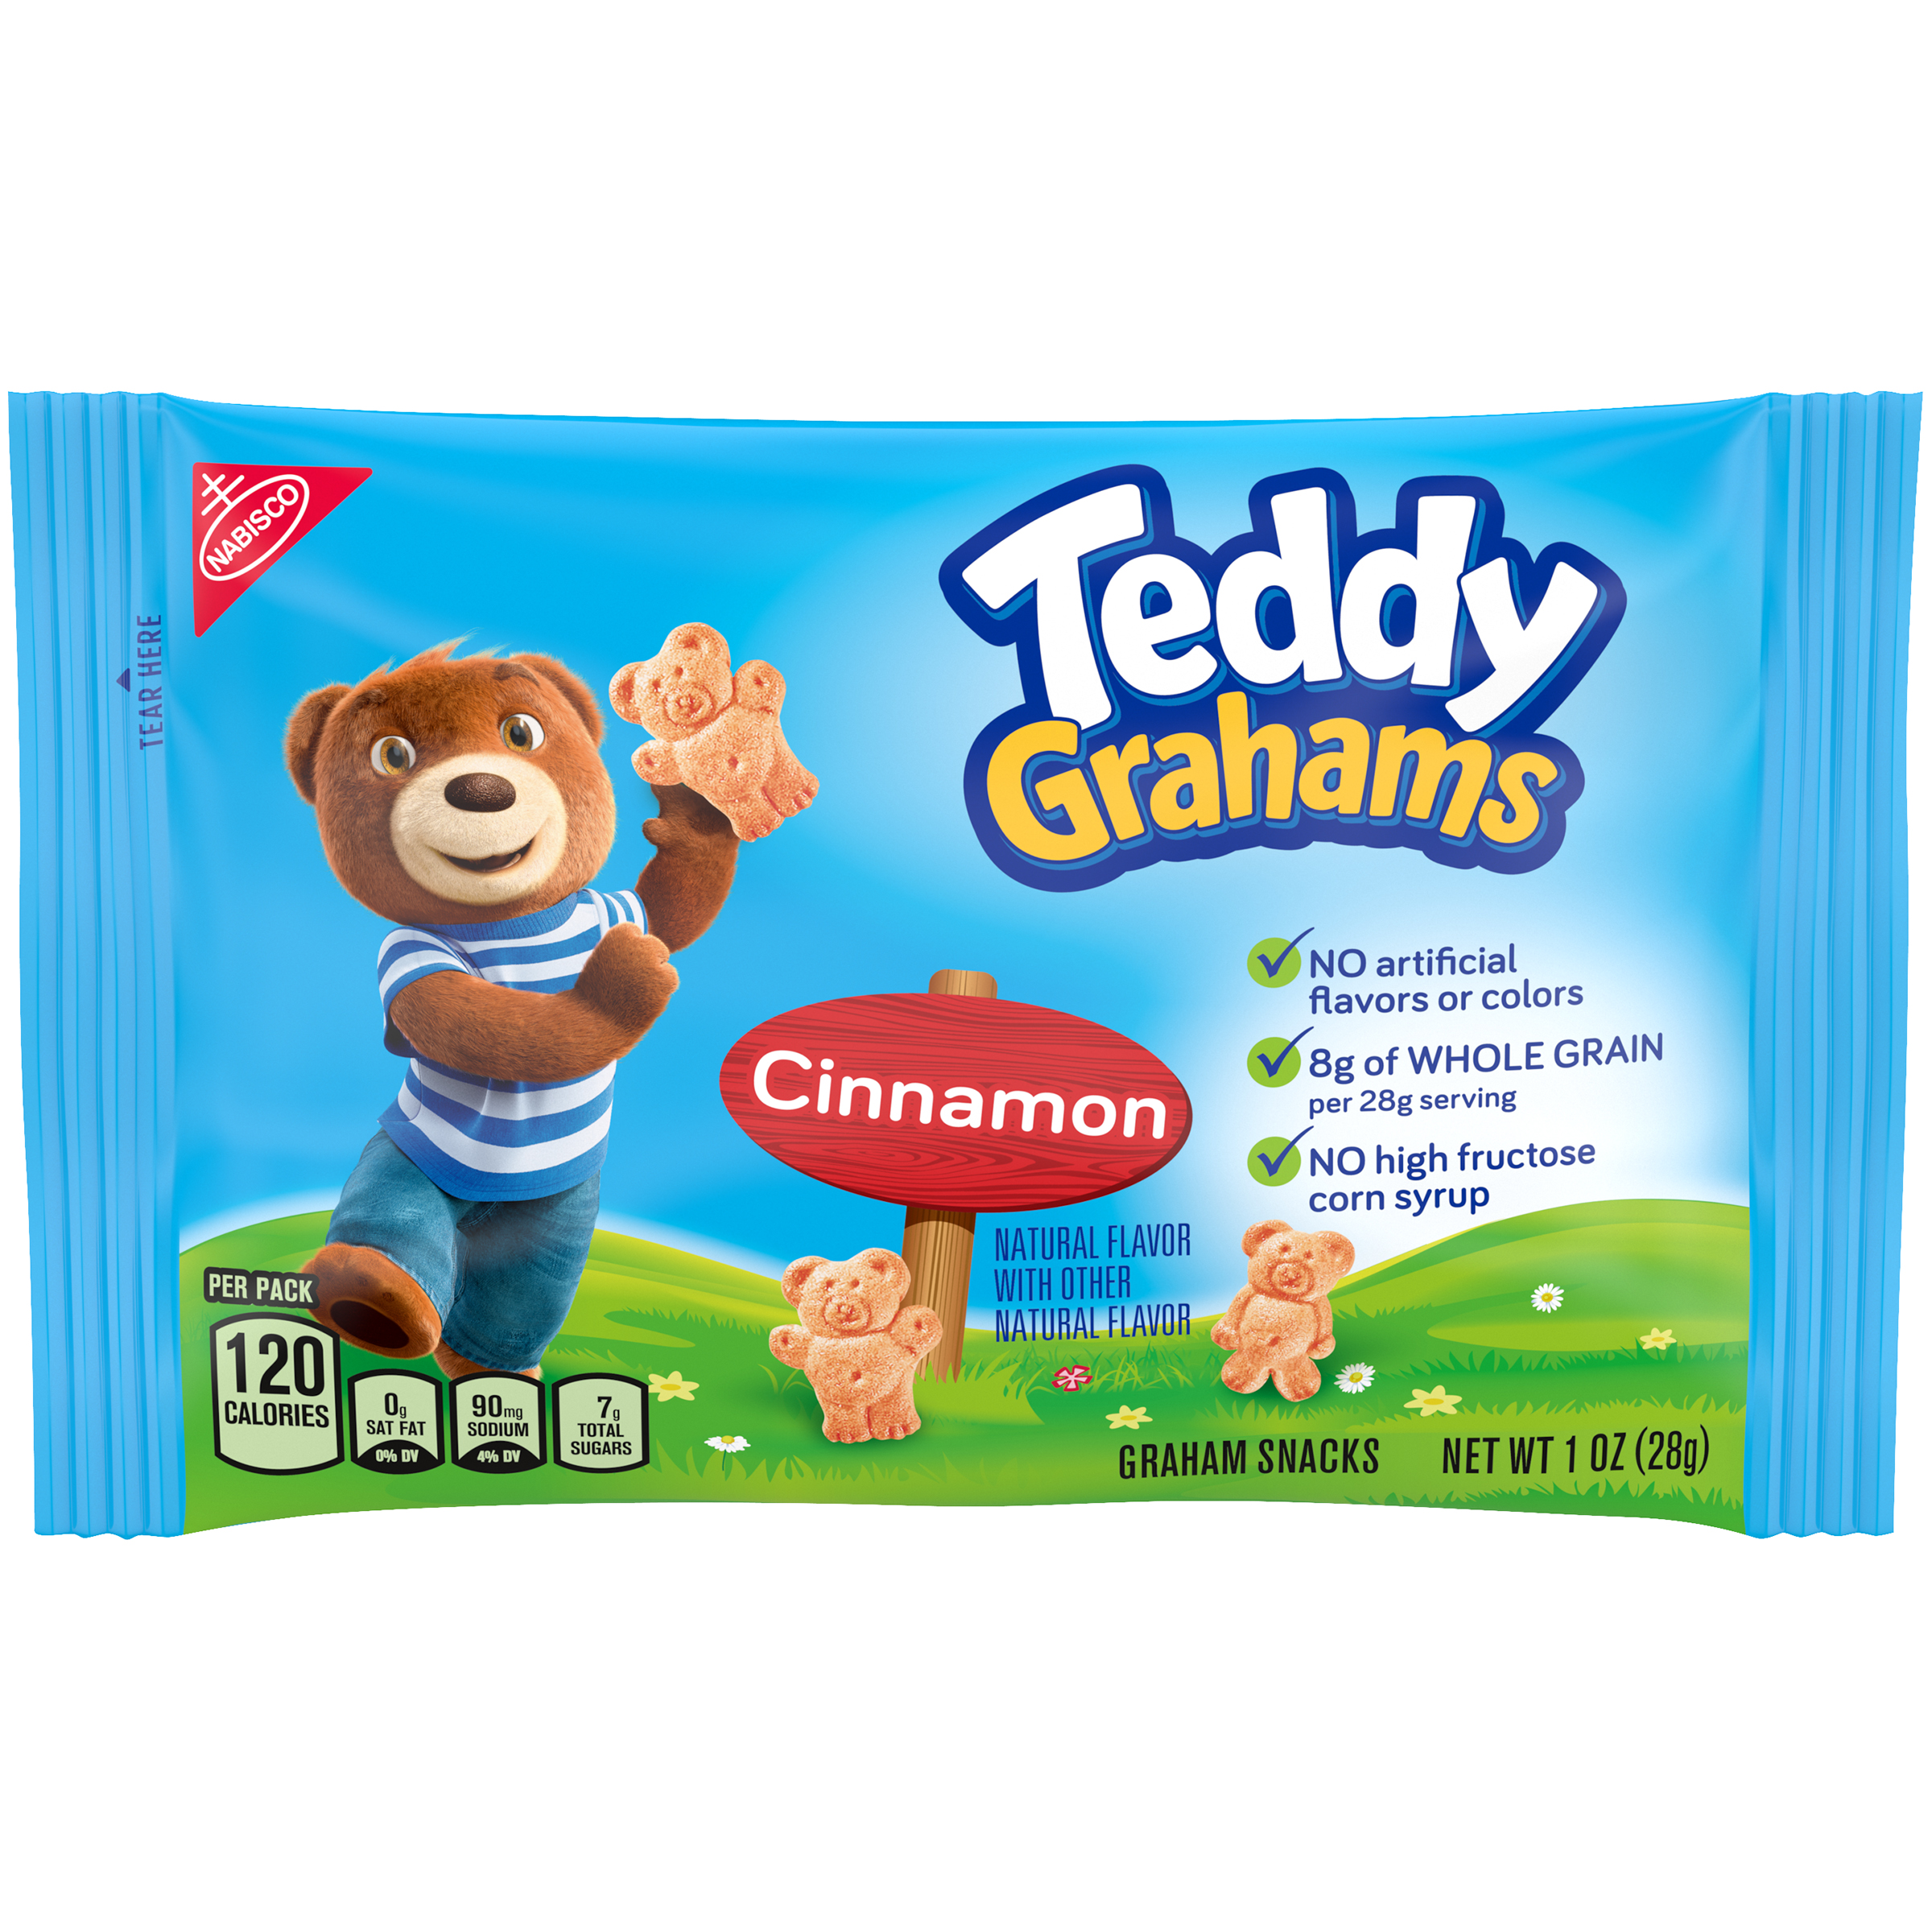 TEDDY GRAHAMS Cinnamon Lunchbox Cookies 1 oz